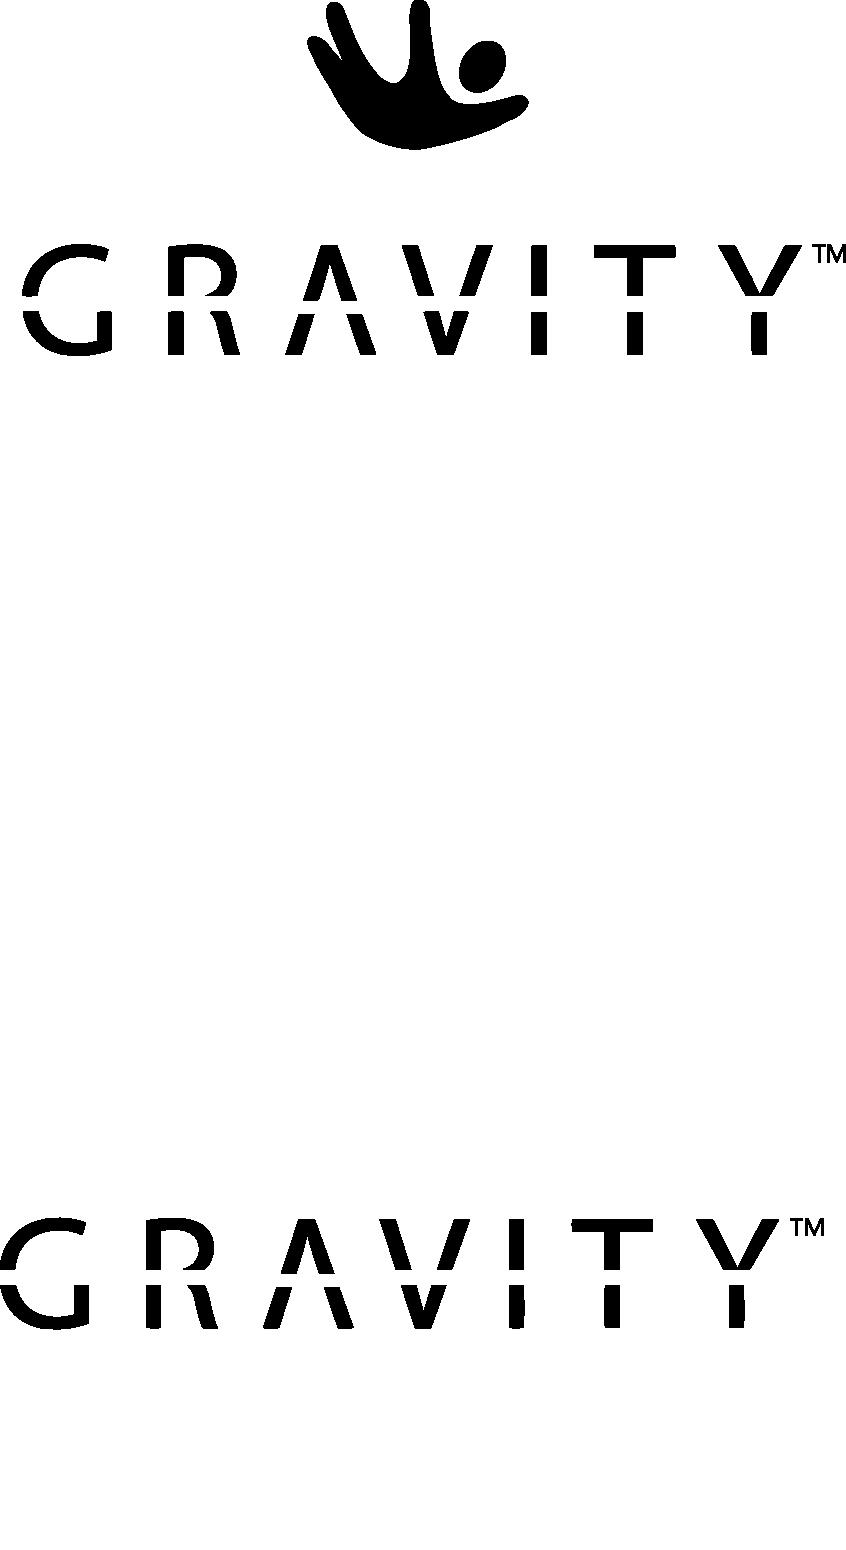 Gravity Blanket logo with shape